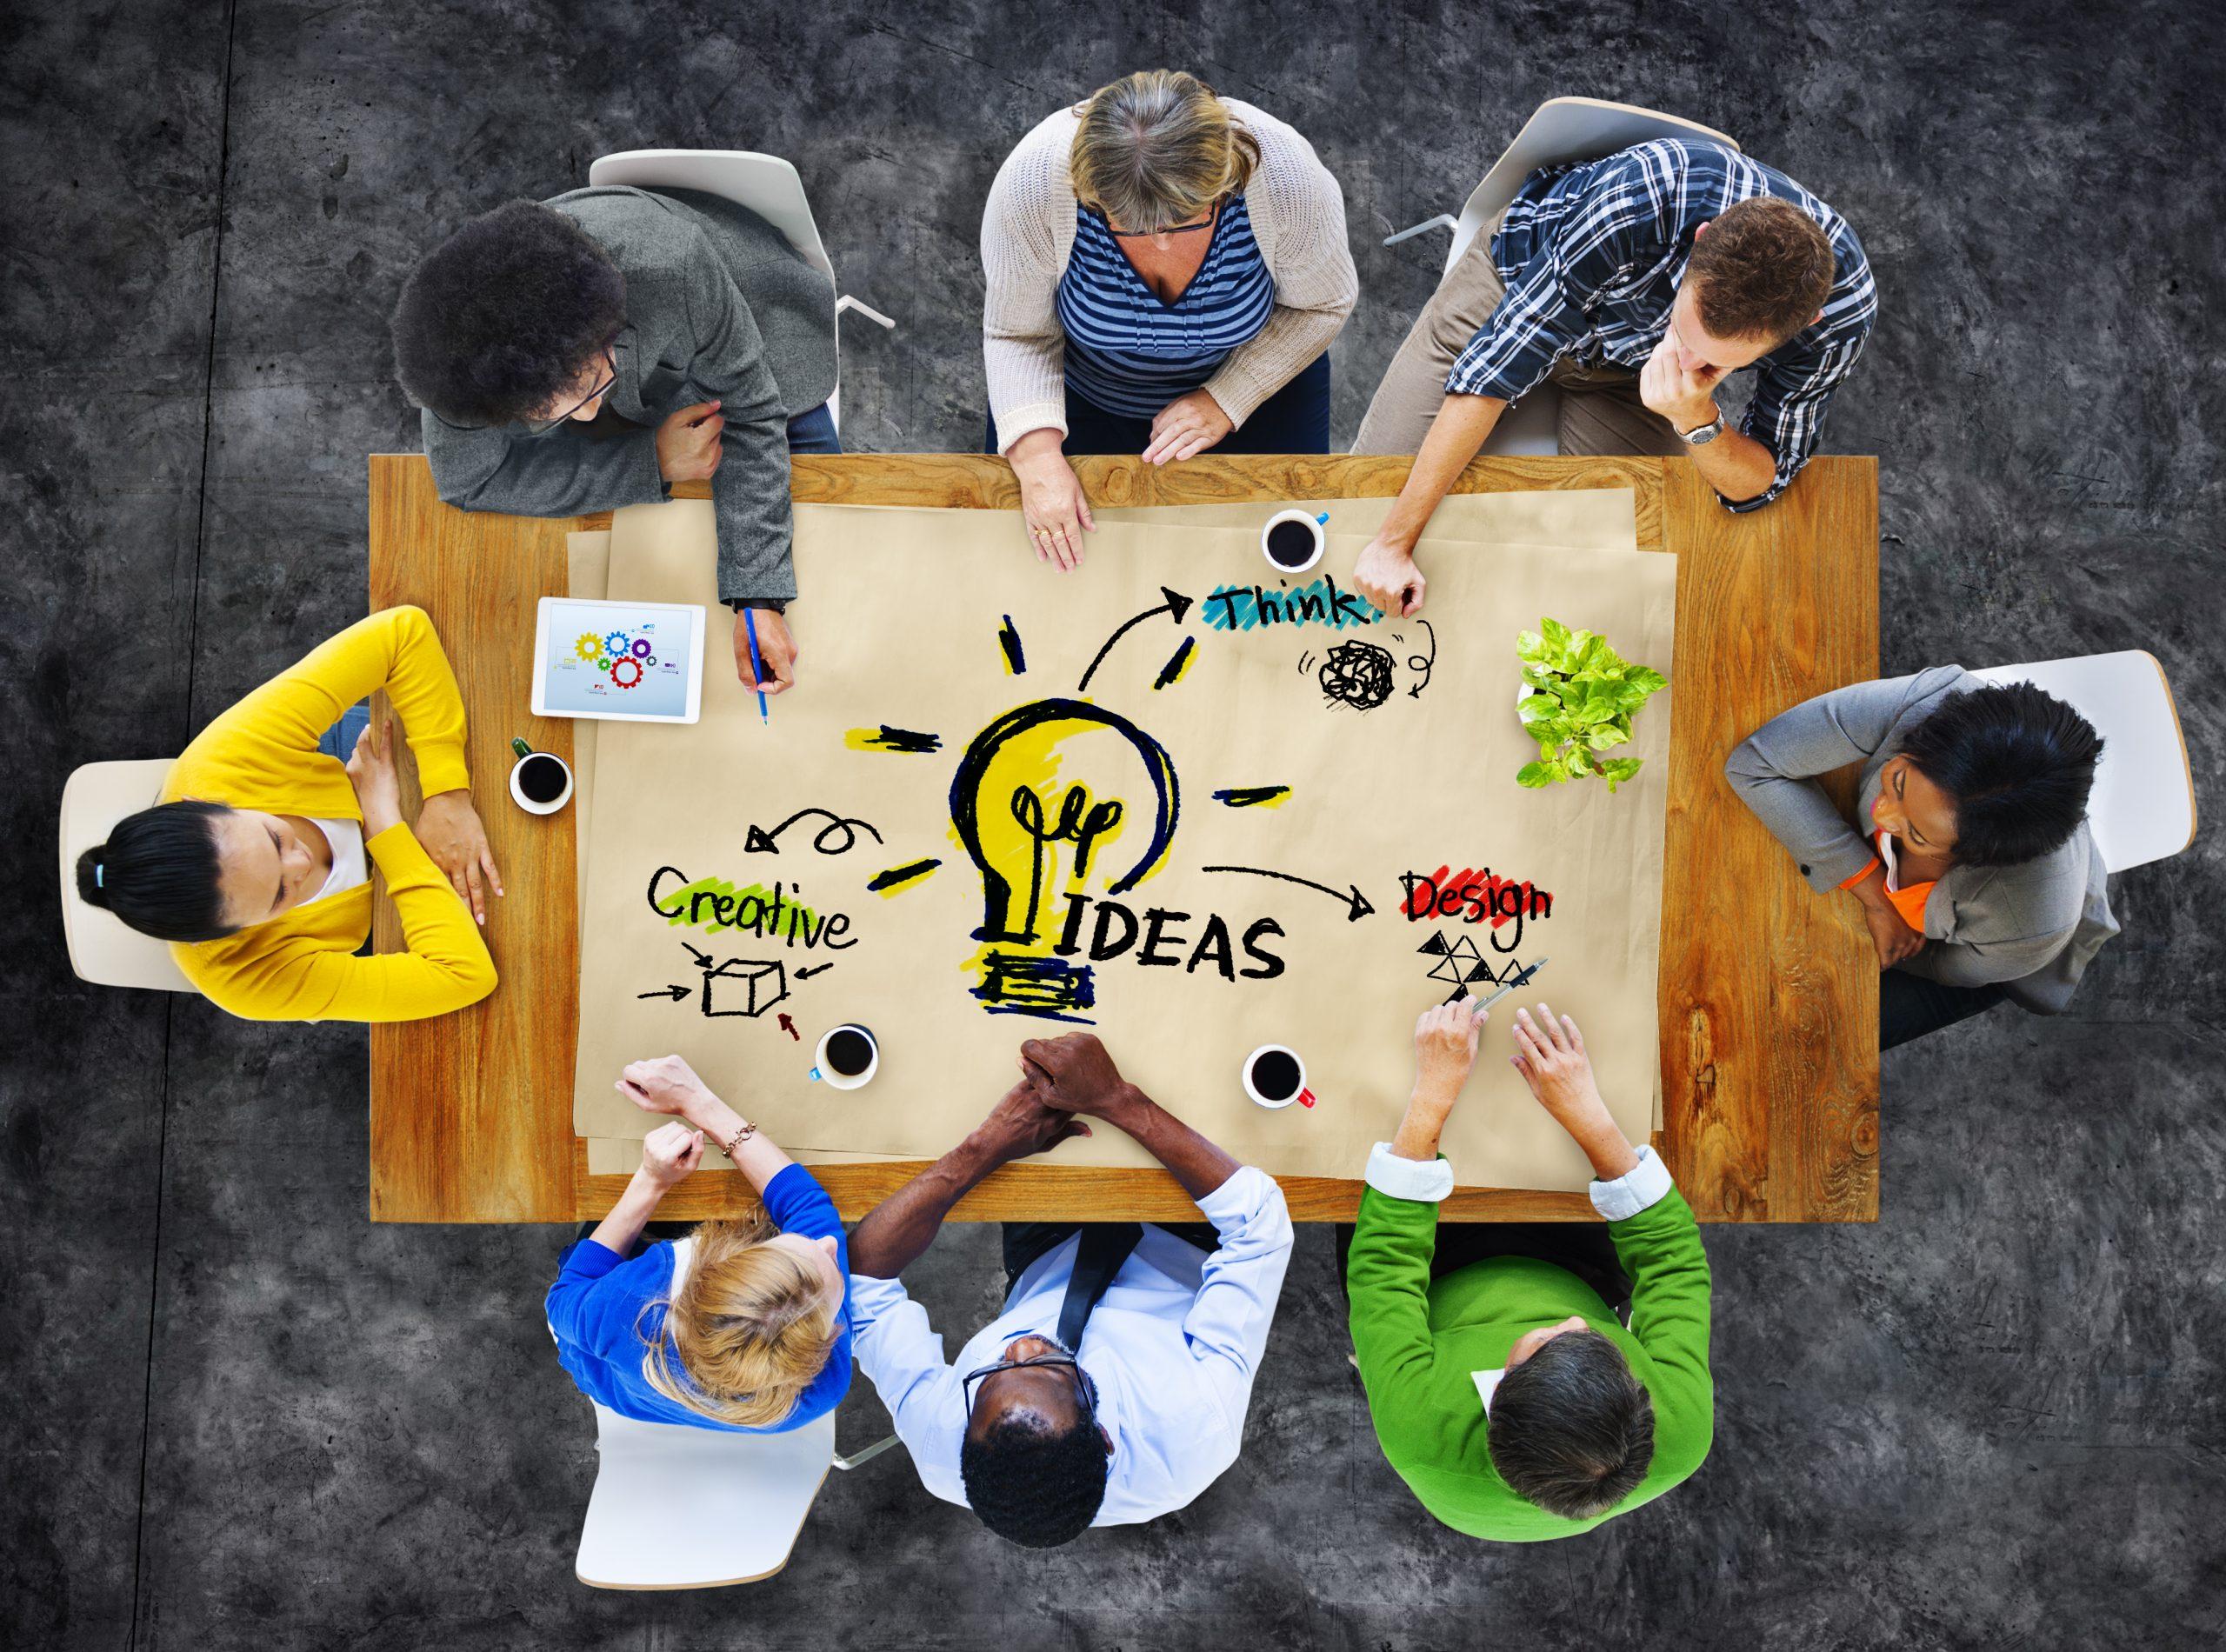 brainstorm niches you love